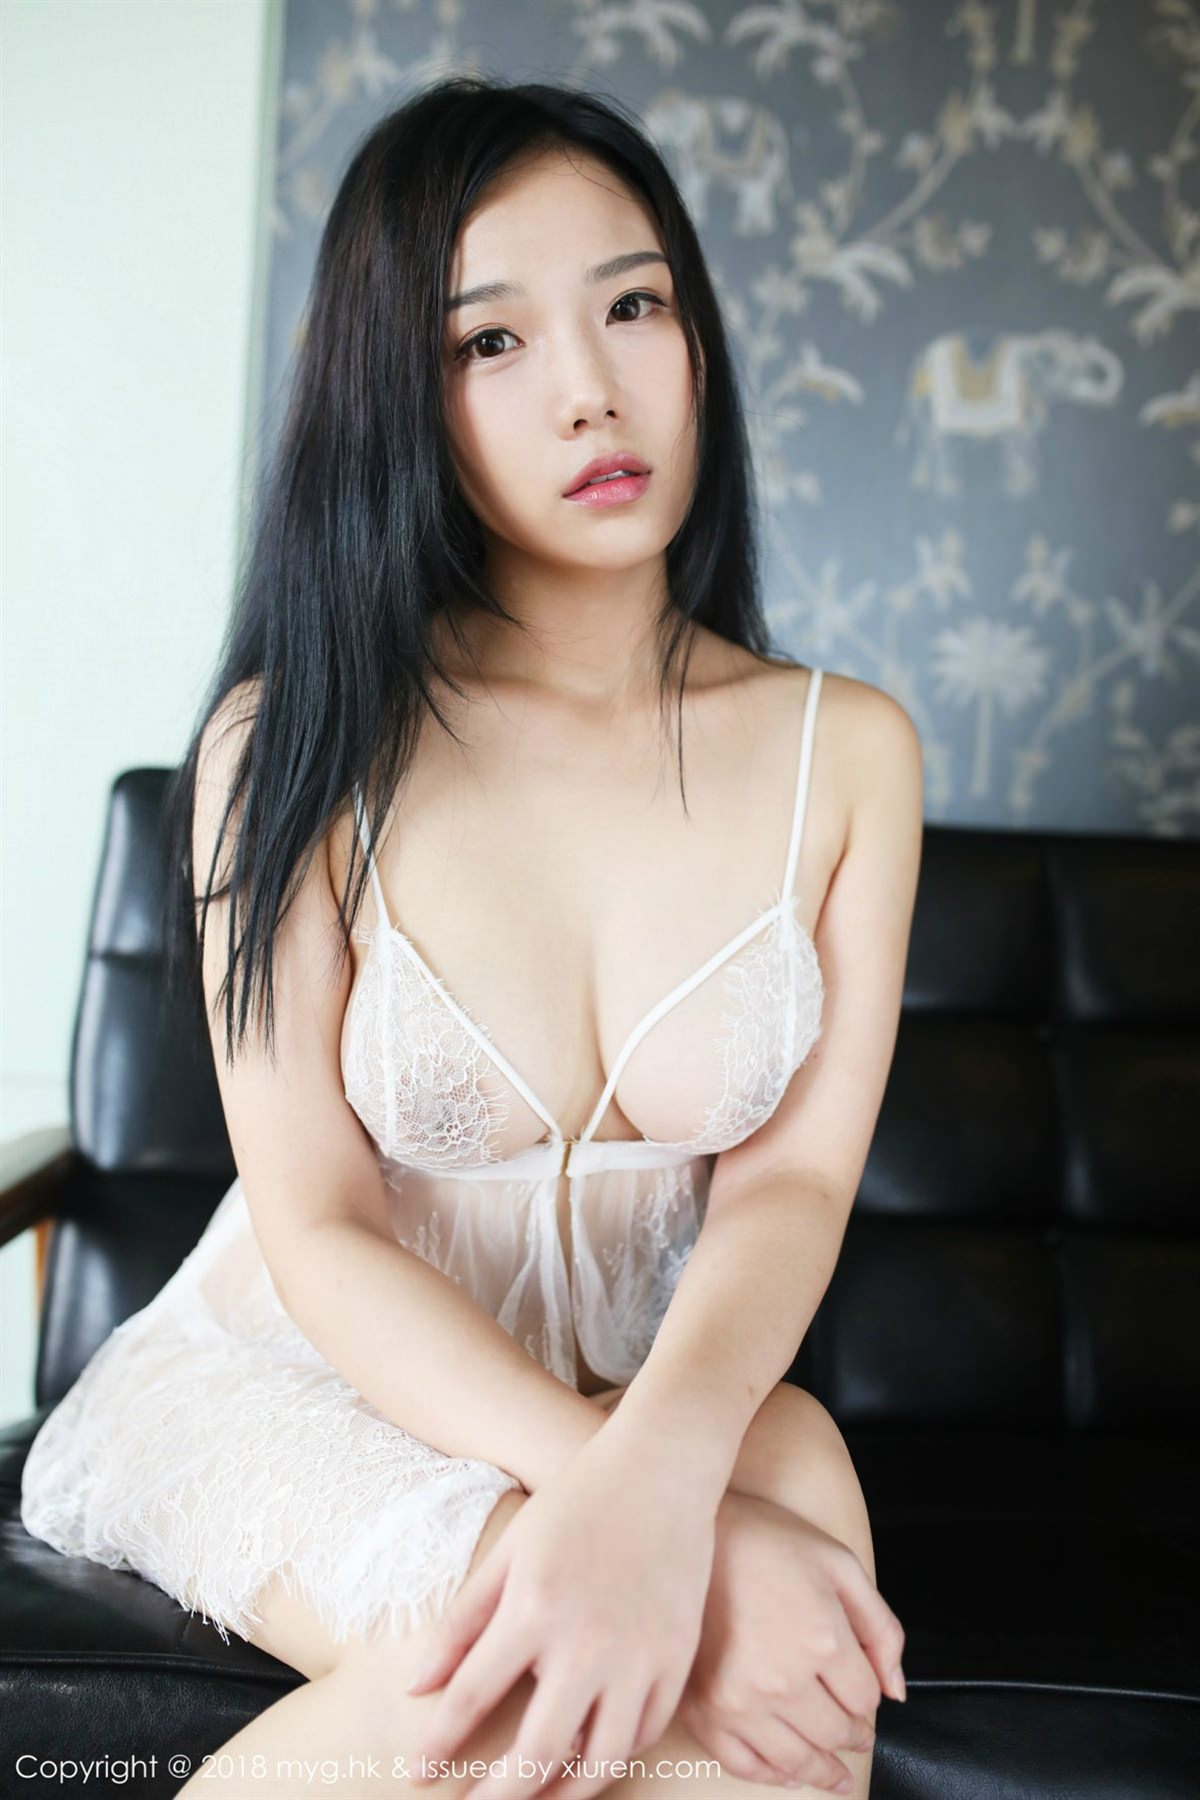 MyGirl Vol.301 24P, mygirl, Xu Wei Wei